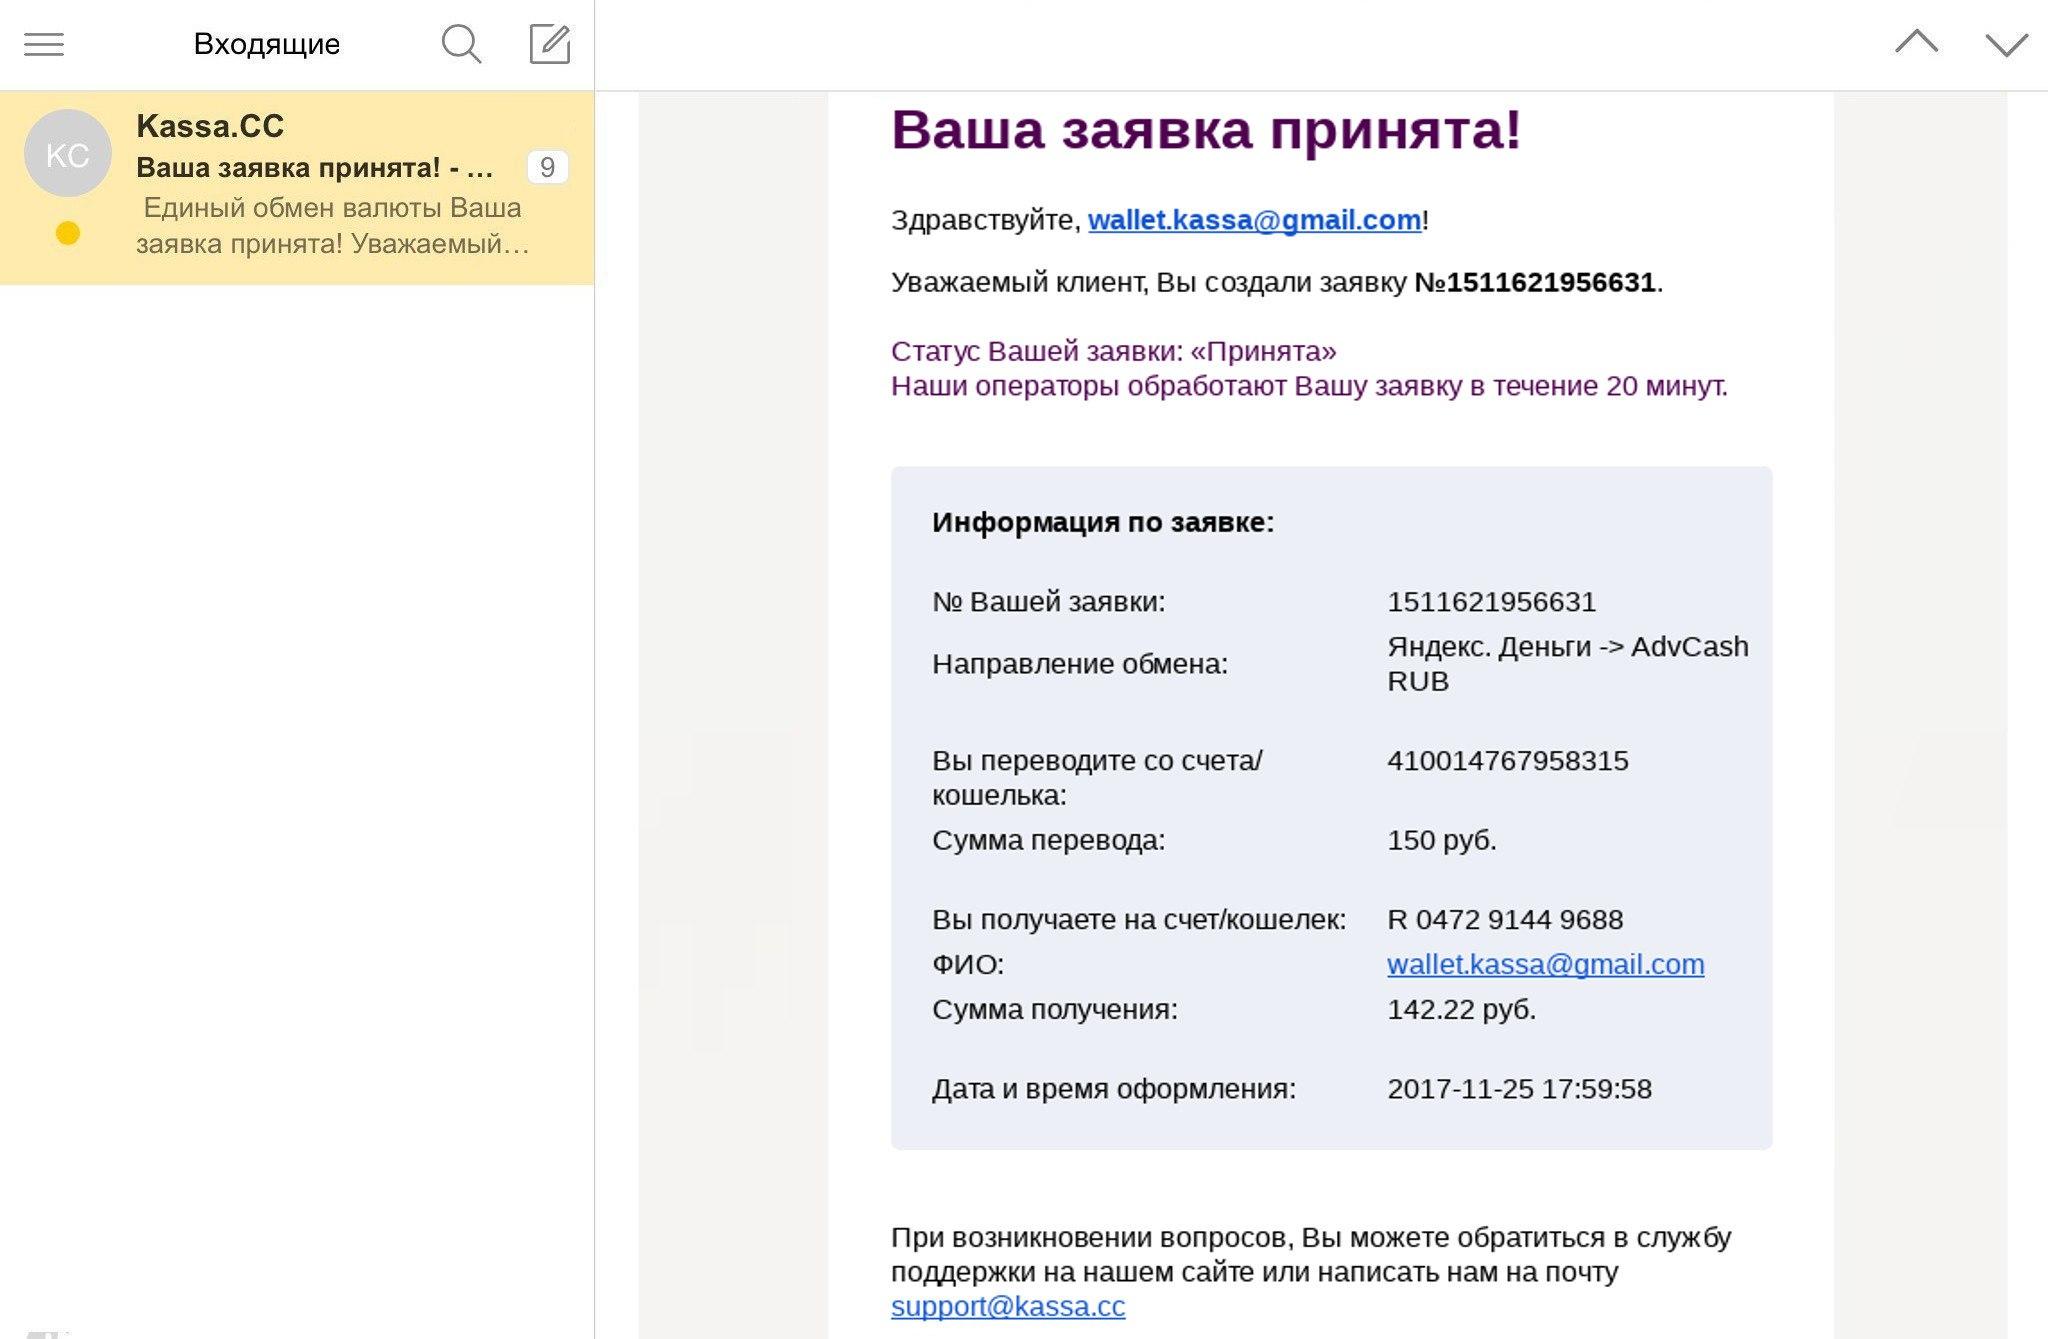 Kassa.cc is a single currency exchange. Exchange Yandex.Money at Advanced Cash RUB